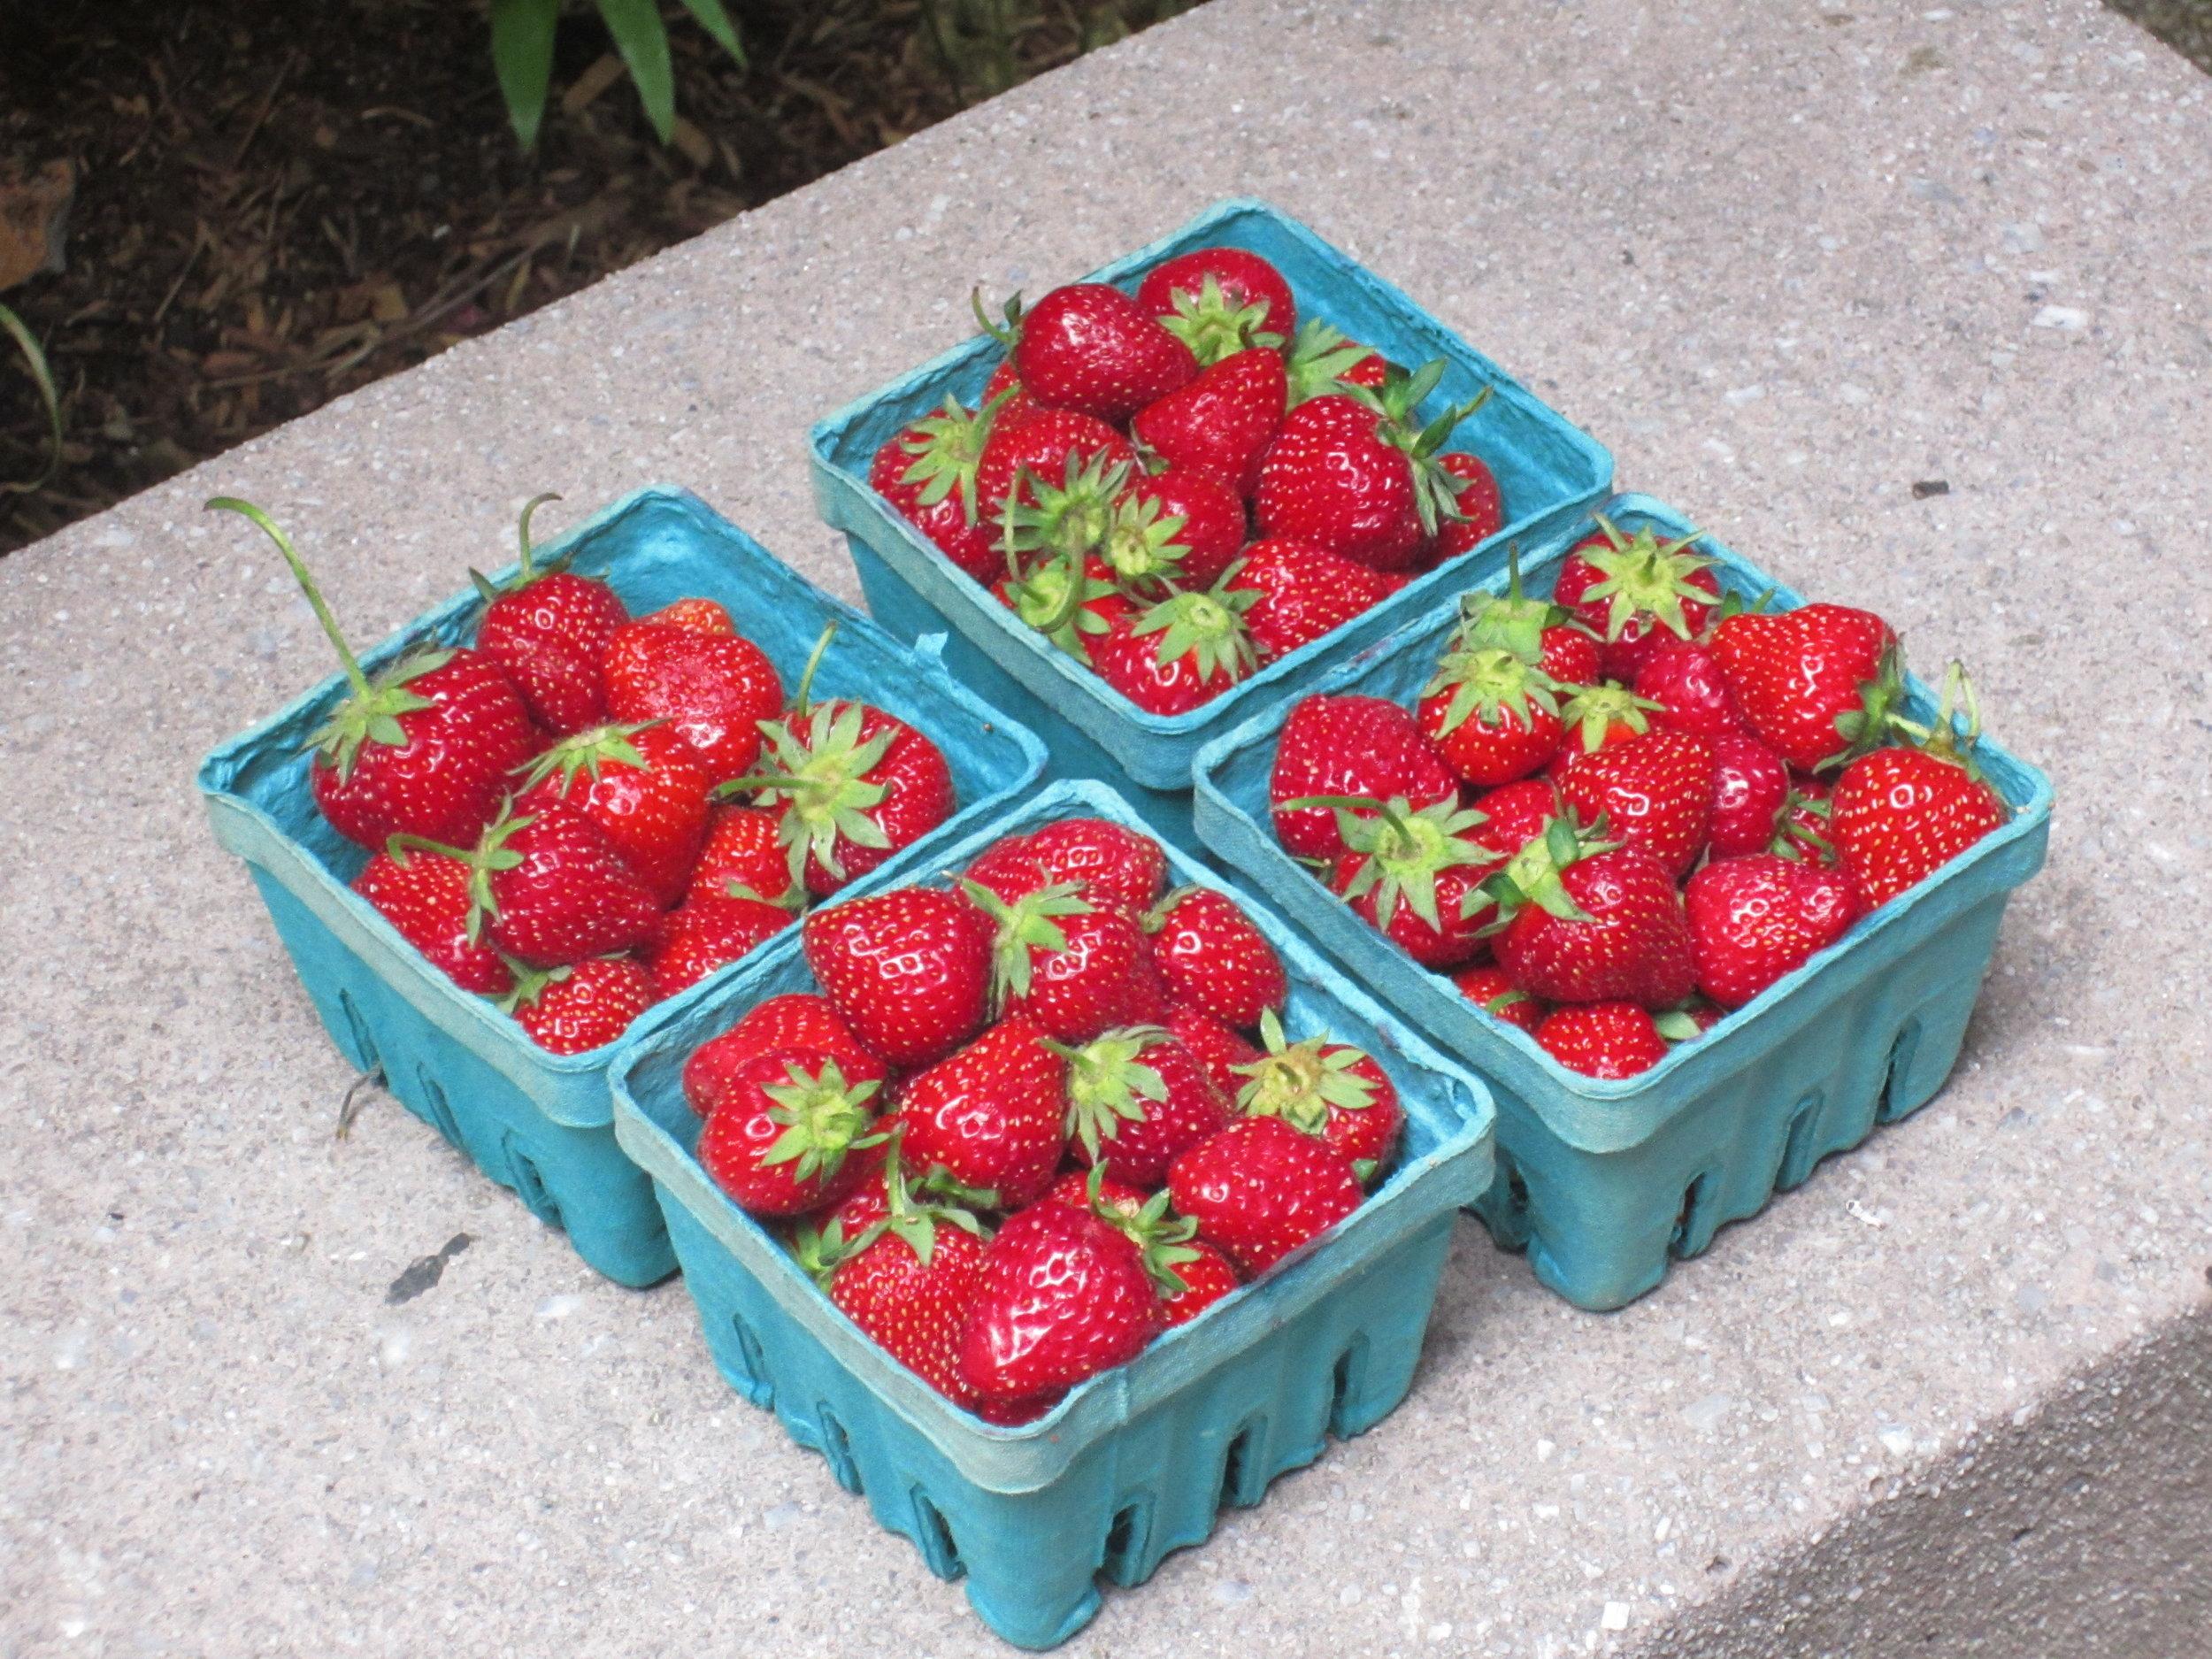 LL Cool S: Ladybugs Love Cool Strawberries ;)